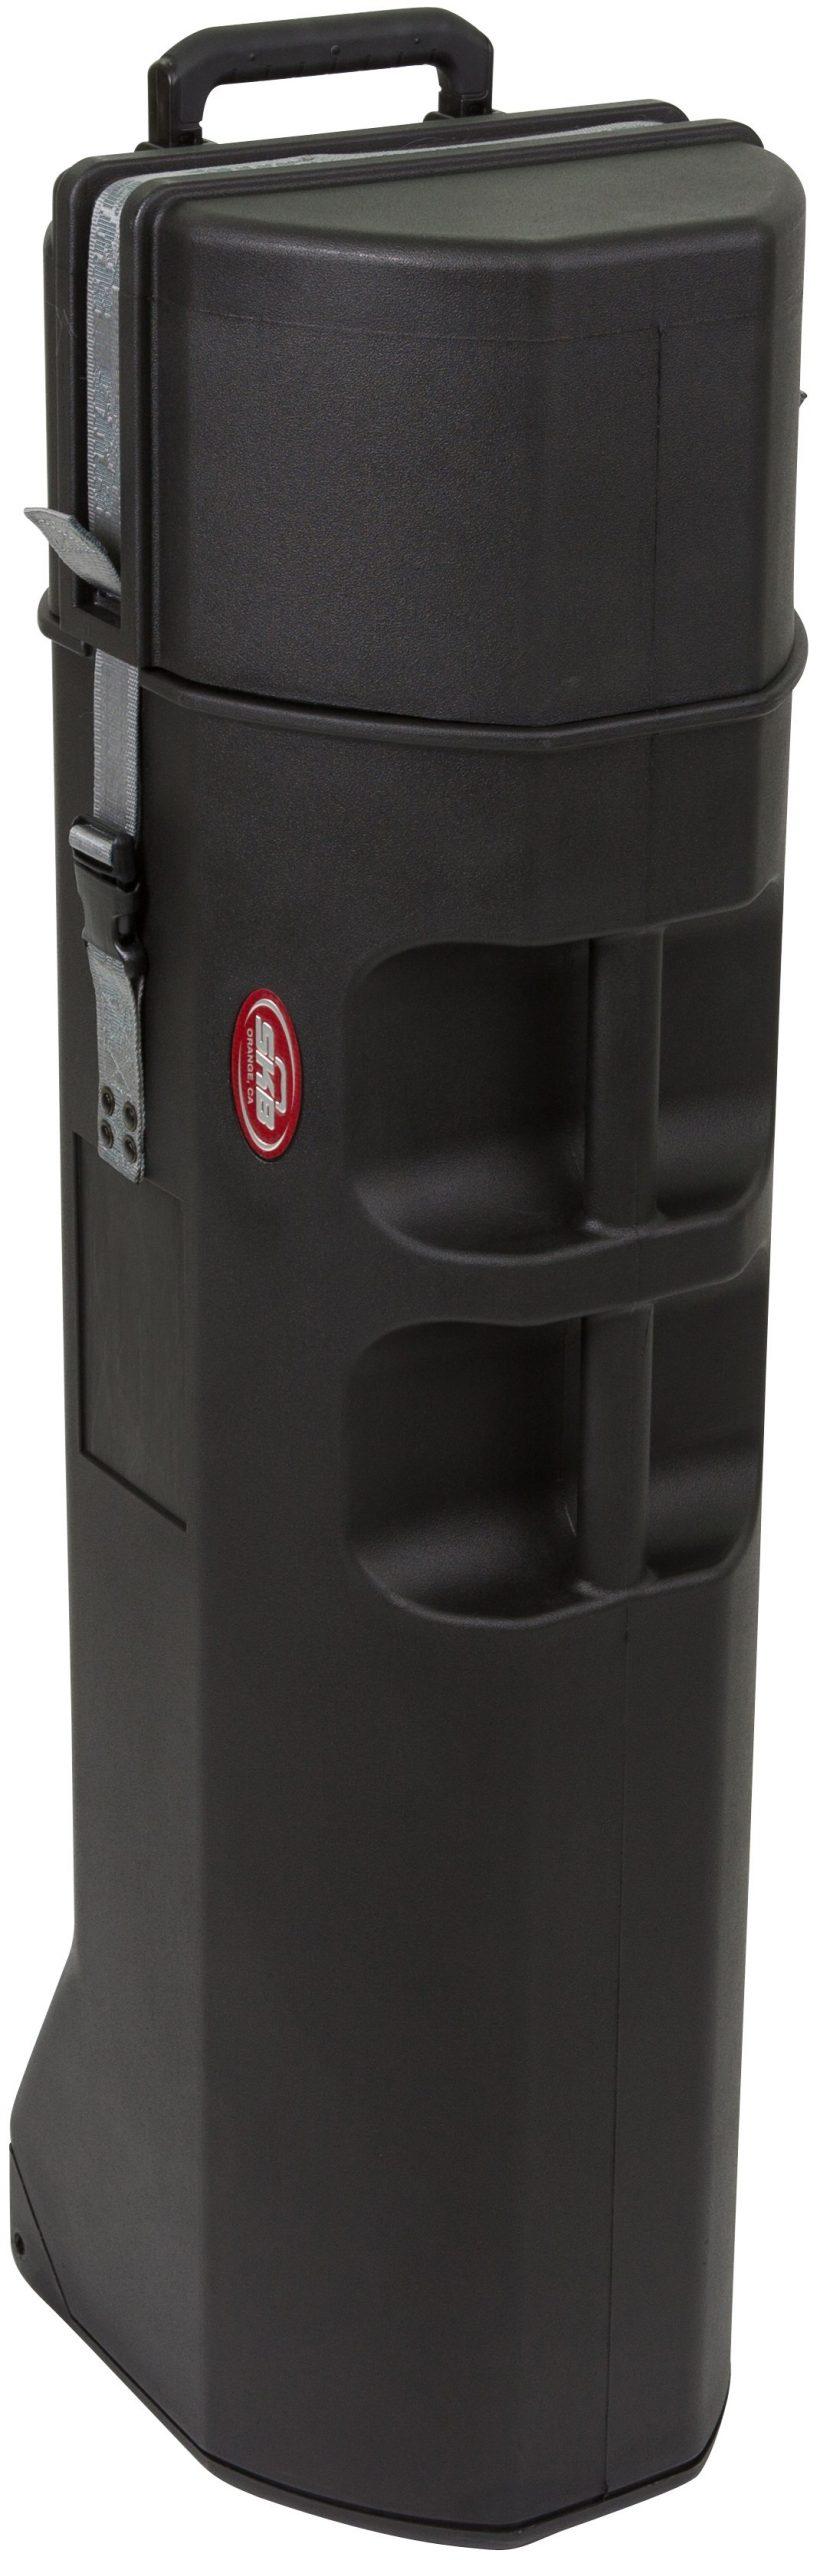 SKB 1SKB-R4111W Case